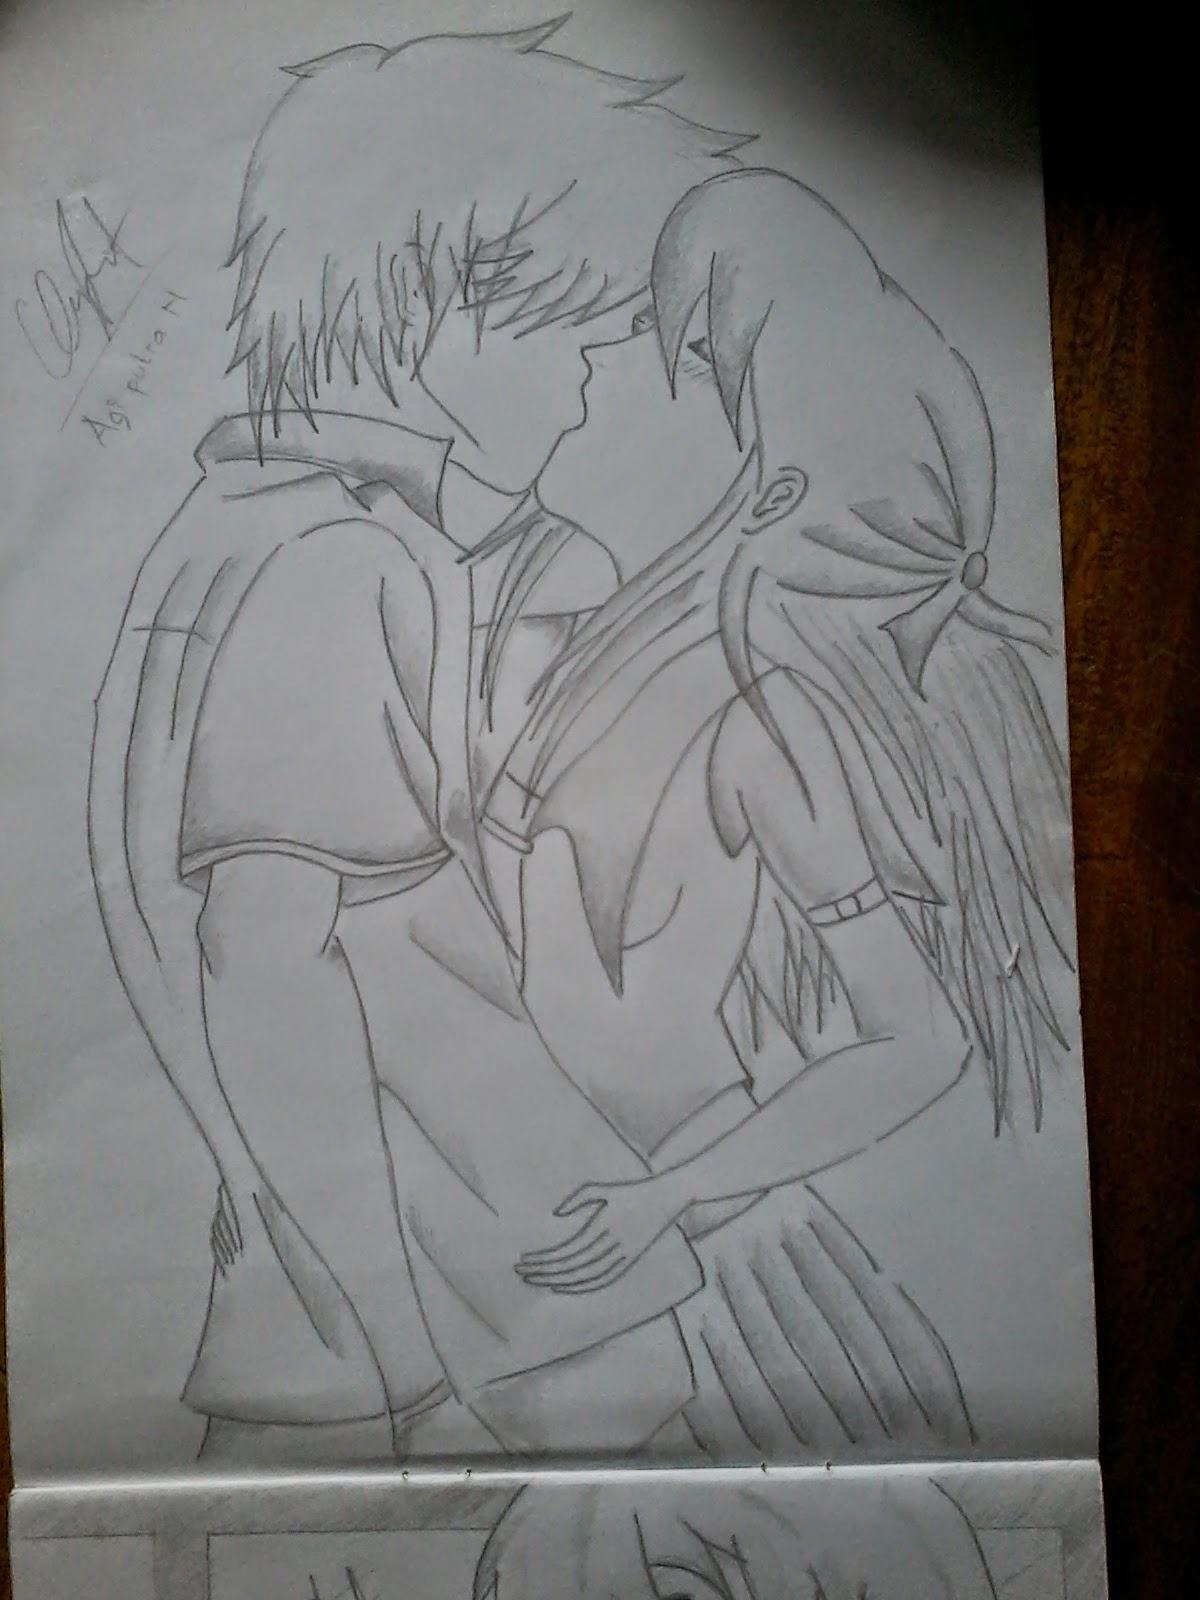 Lukisan Pensil Kartun Anime Brad Erva Doce Info